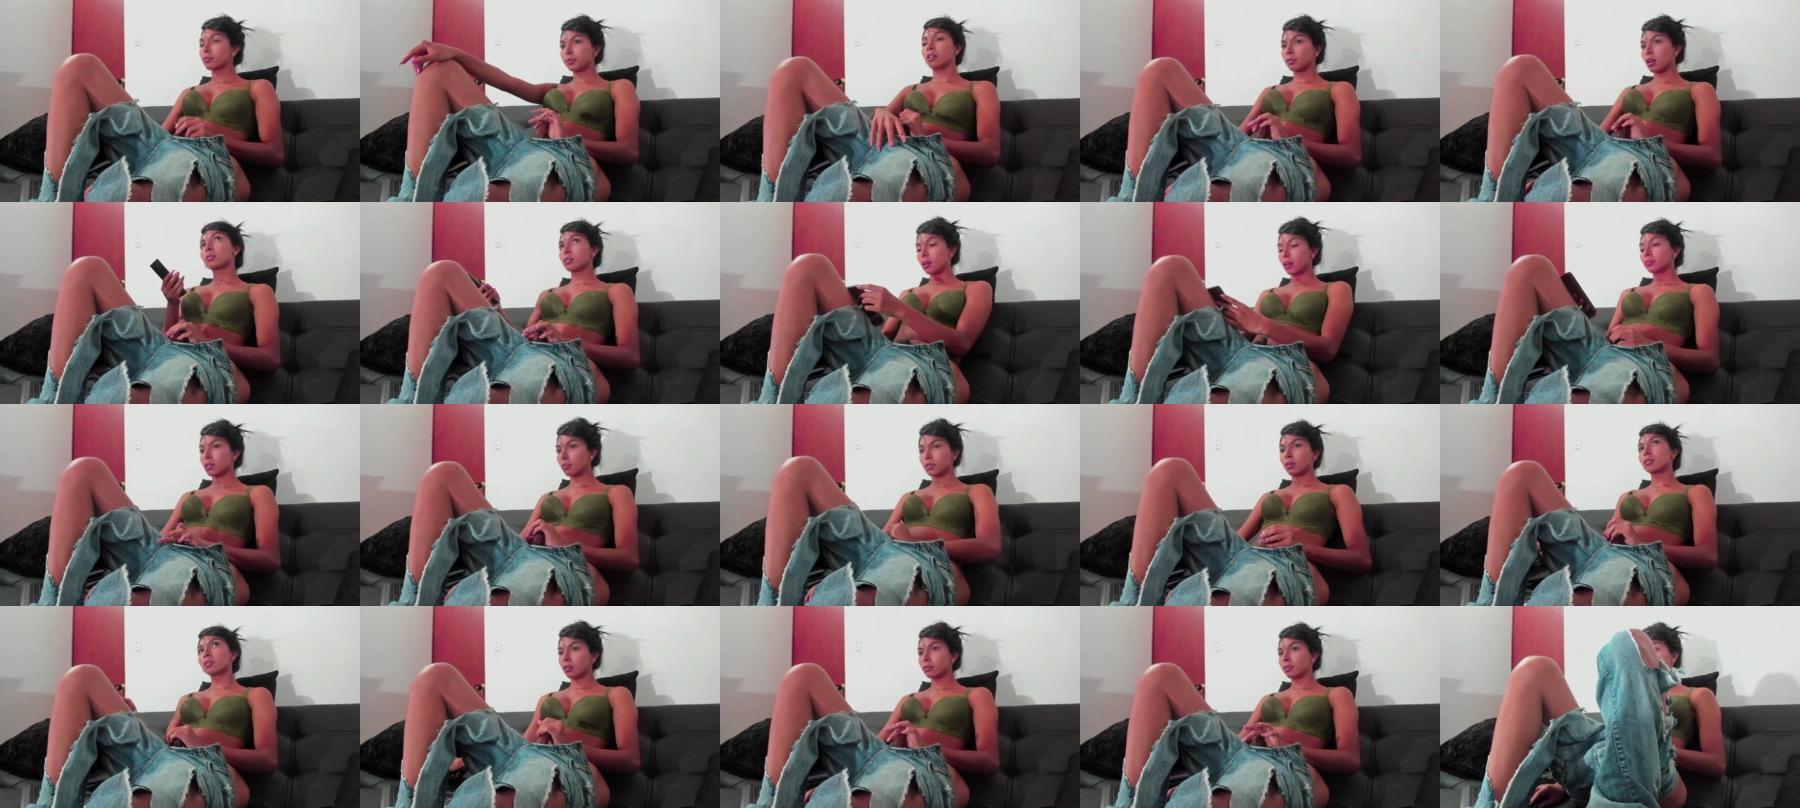 Kimbrune20 ts 13-10-2021 Chaturbate trans Topless